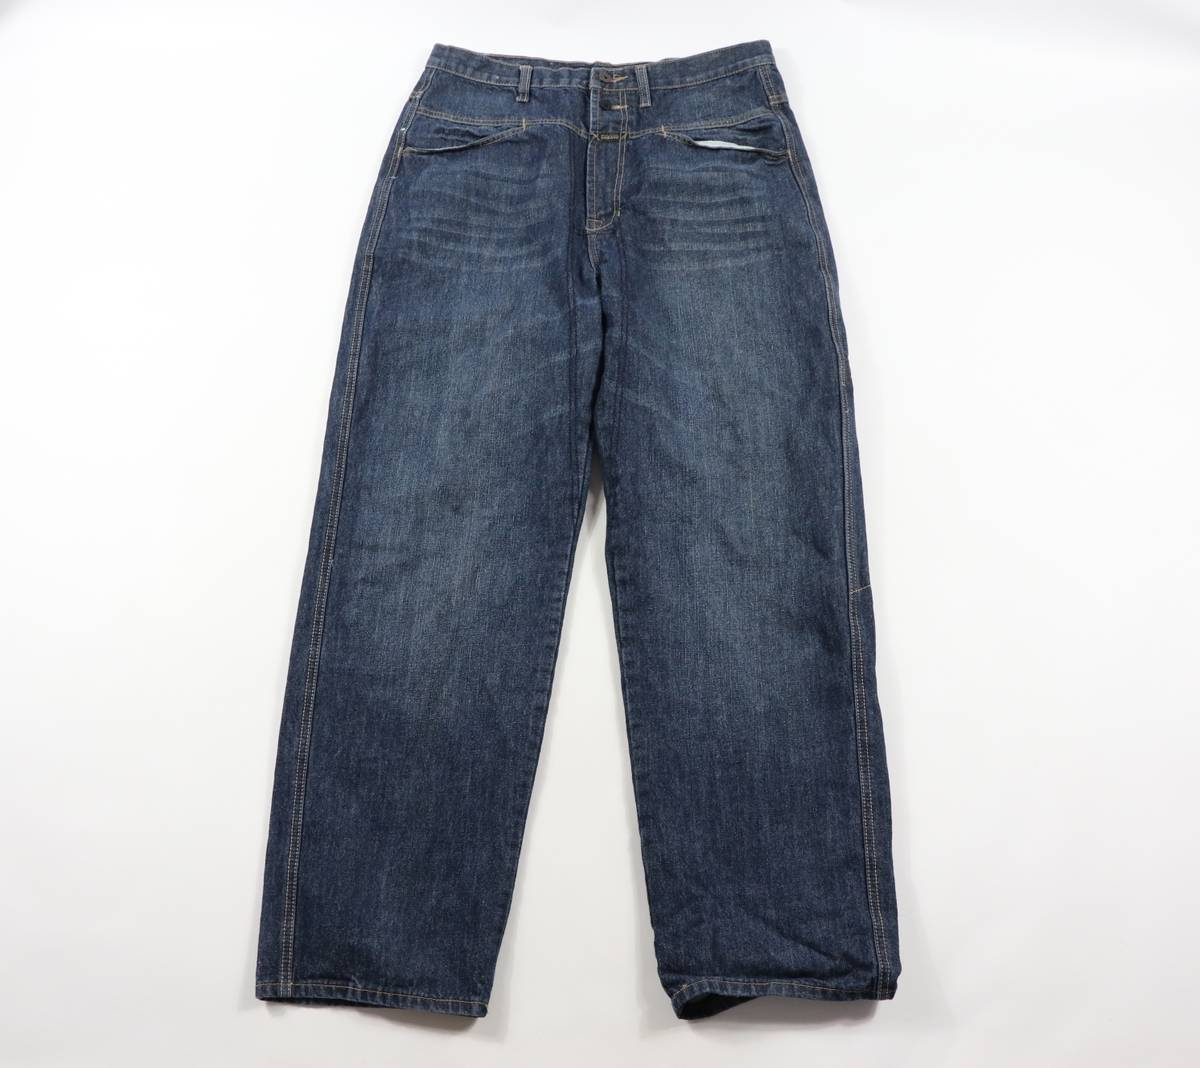 Girbaud 90s Girbaud Jeans 90s Marithe Francois Girbaud 90s Marithe Francois Girbaud Spell Out Stitched Denim Jeans Pants Blue Mens 34x34